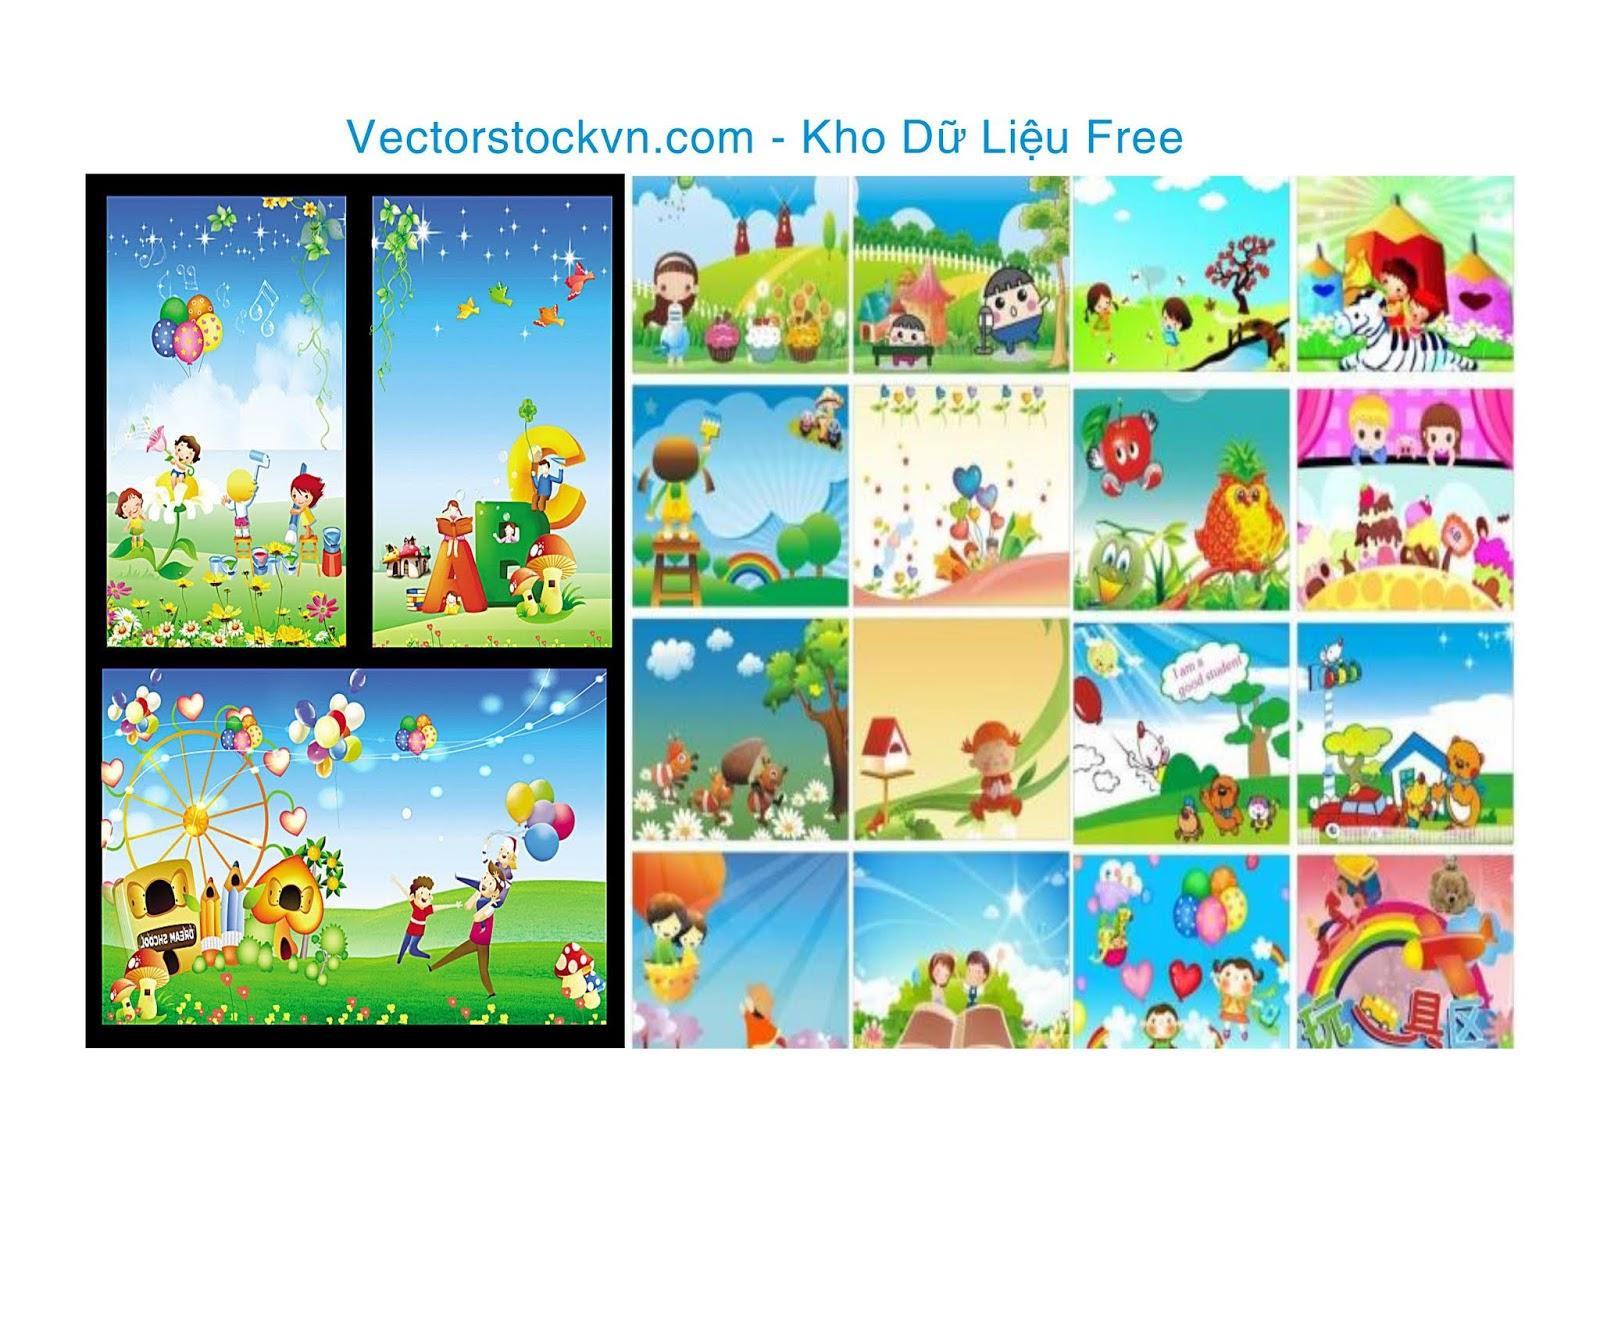 vectorstockvn.com Kho dữ liệu free lớn nhất việt nam.